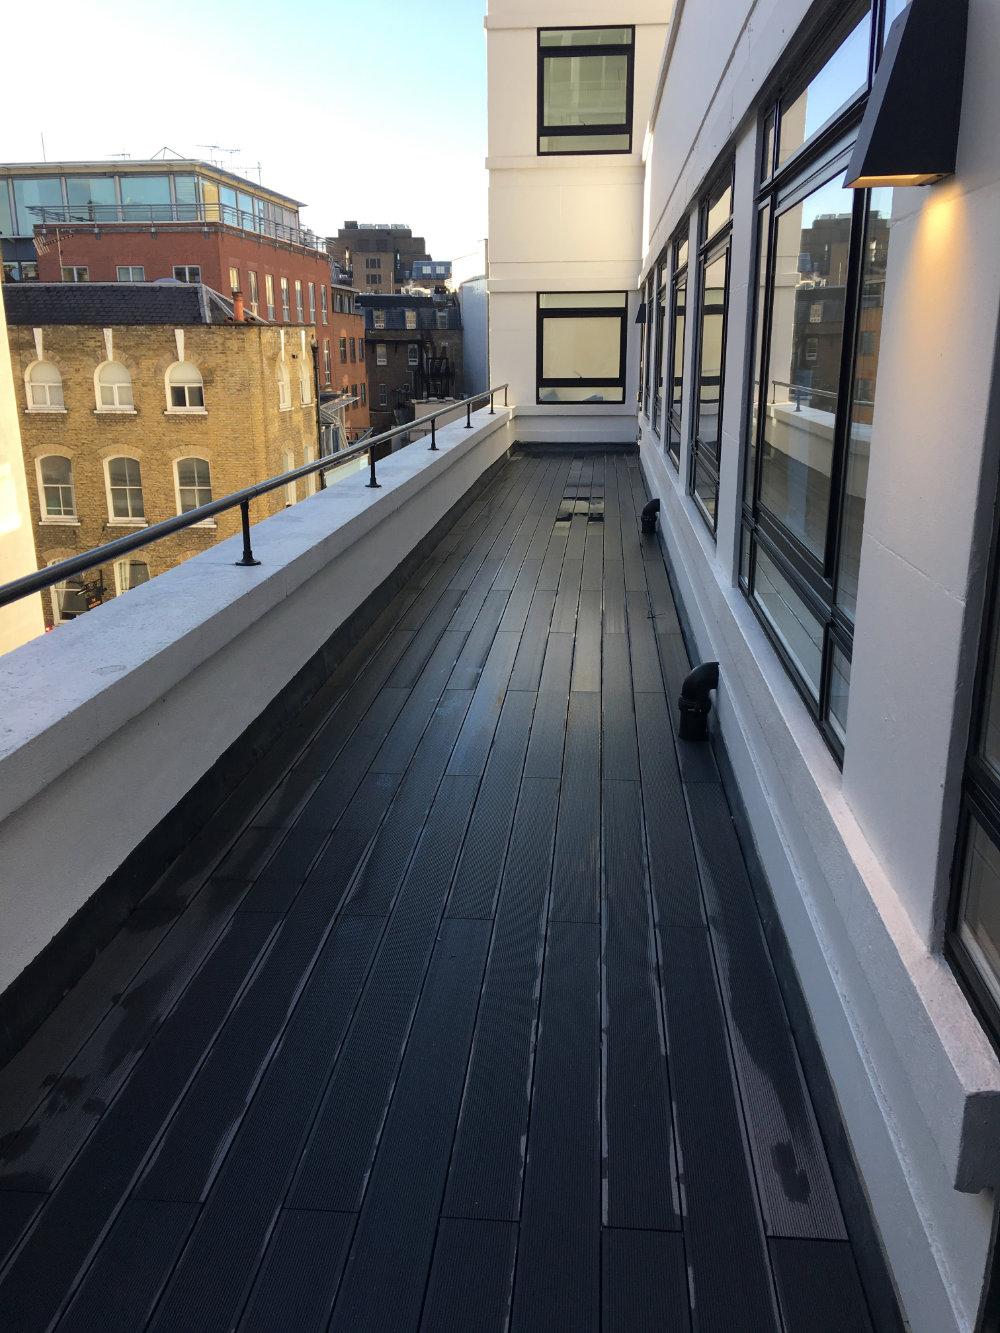 Roof terrace in Mayfair Before